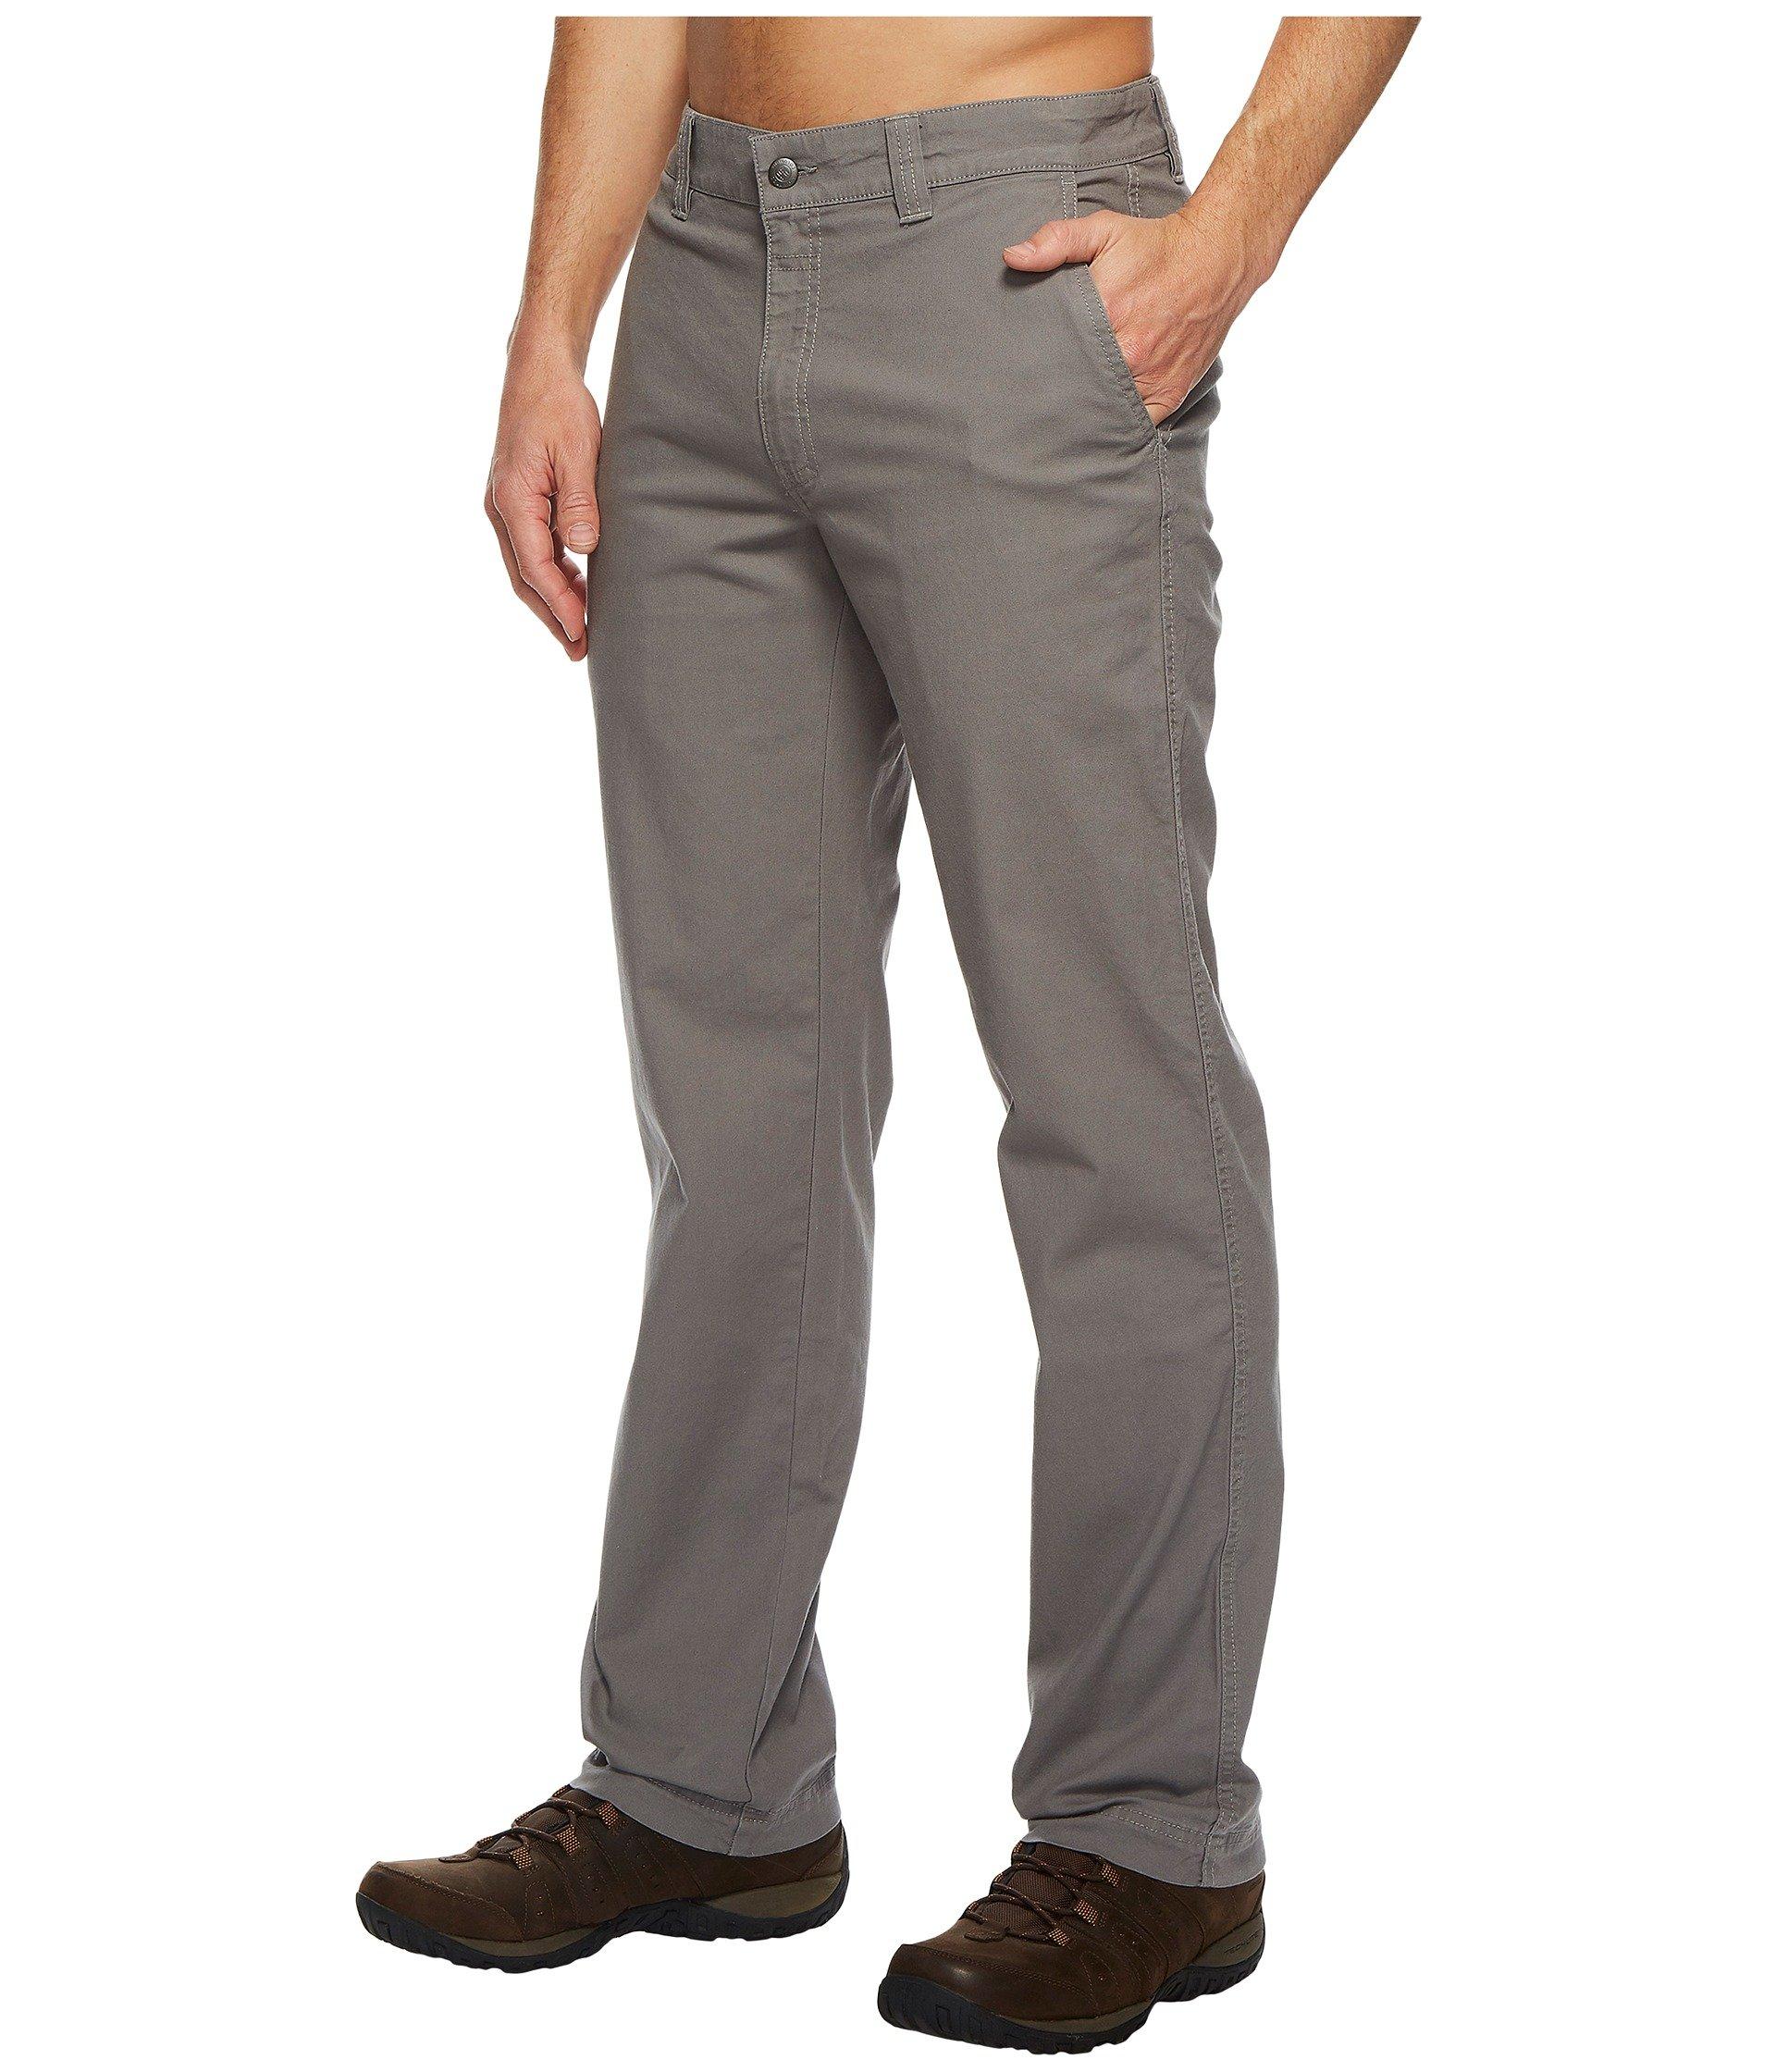 Pants Boulder Flex Columbia Roc™ Columbia Roc™ Roc™ Flex Pants Columbia Boulder Flex Pants Boulder pAtxqnwB4